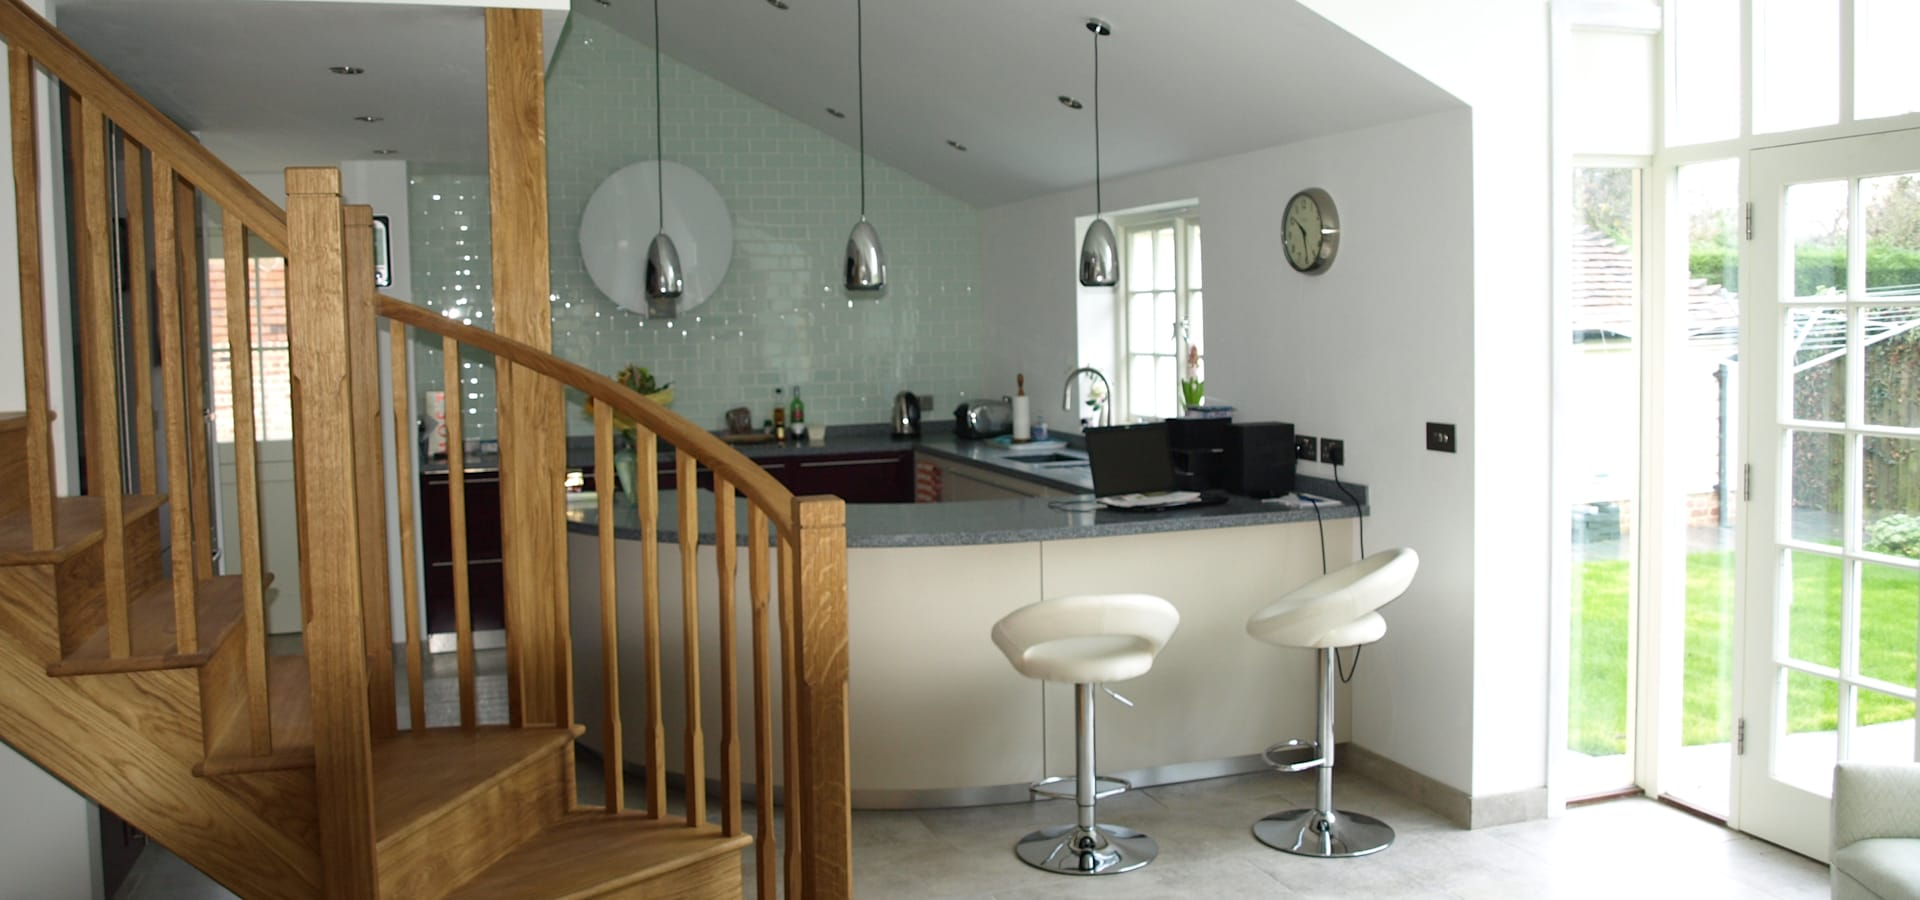 Manning Duffie Architects Ltd